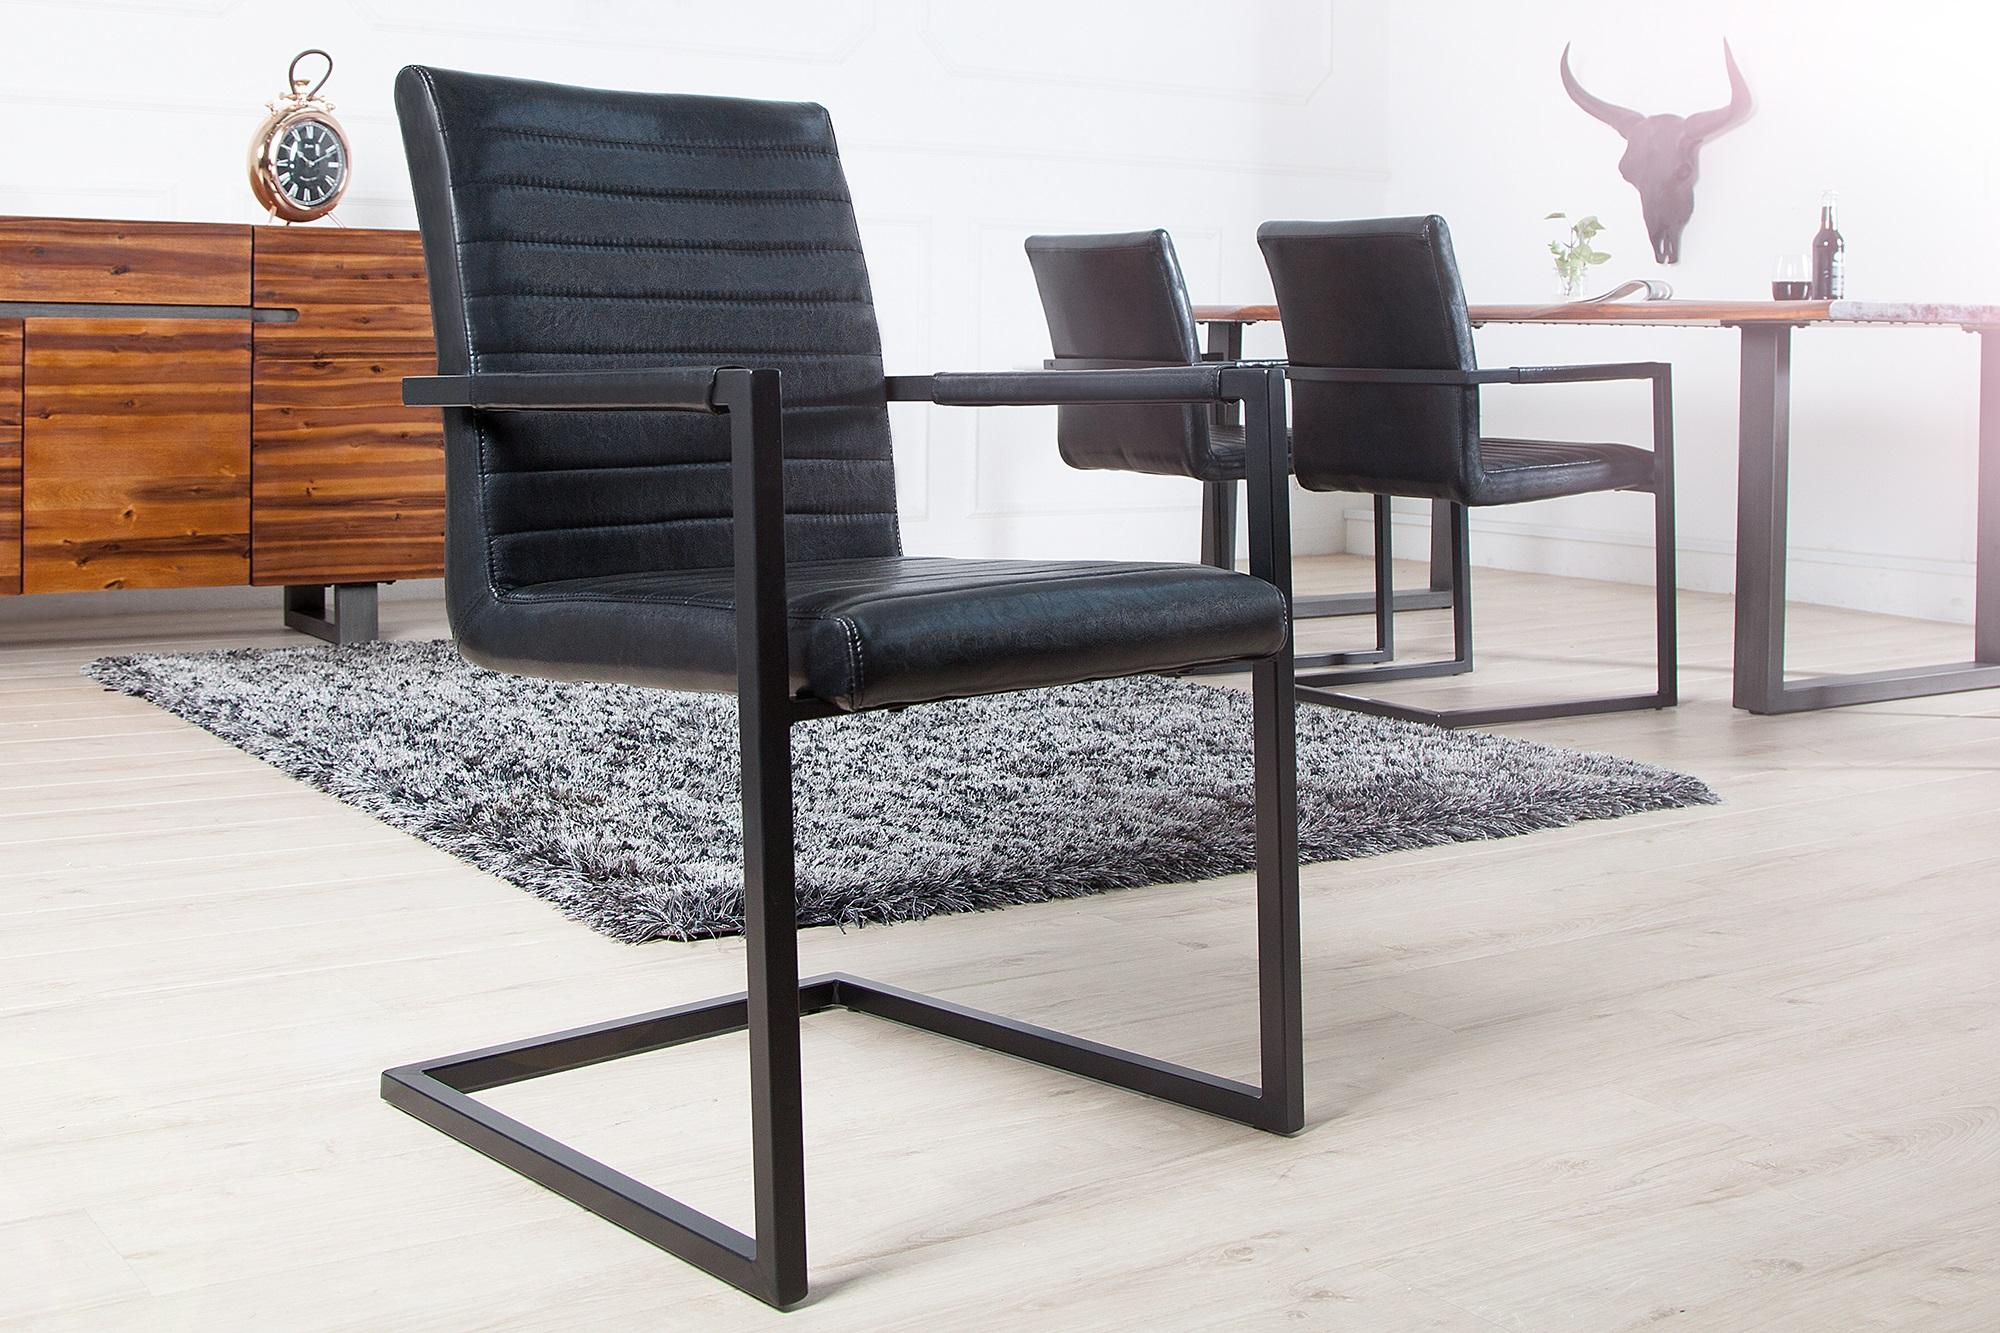 Stoel Metalen Frame : Moderne eetkamerstoel kopen aktie wonen